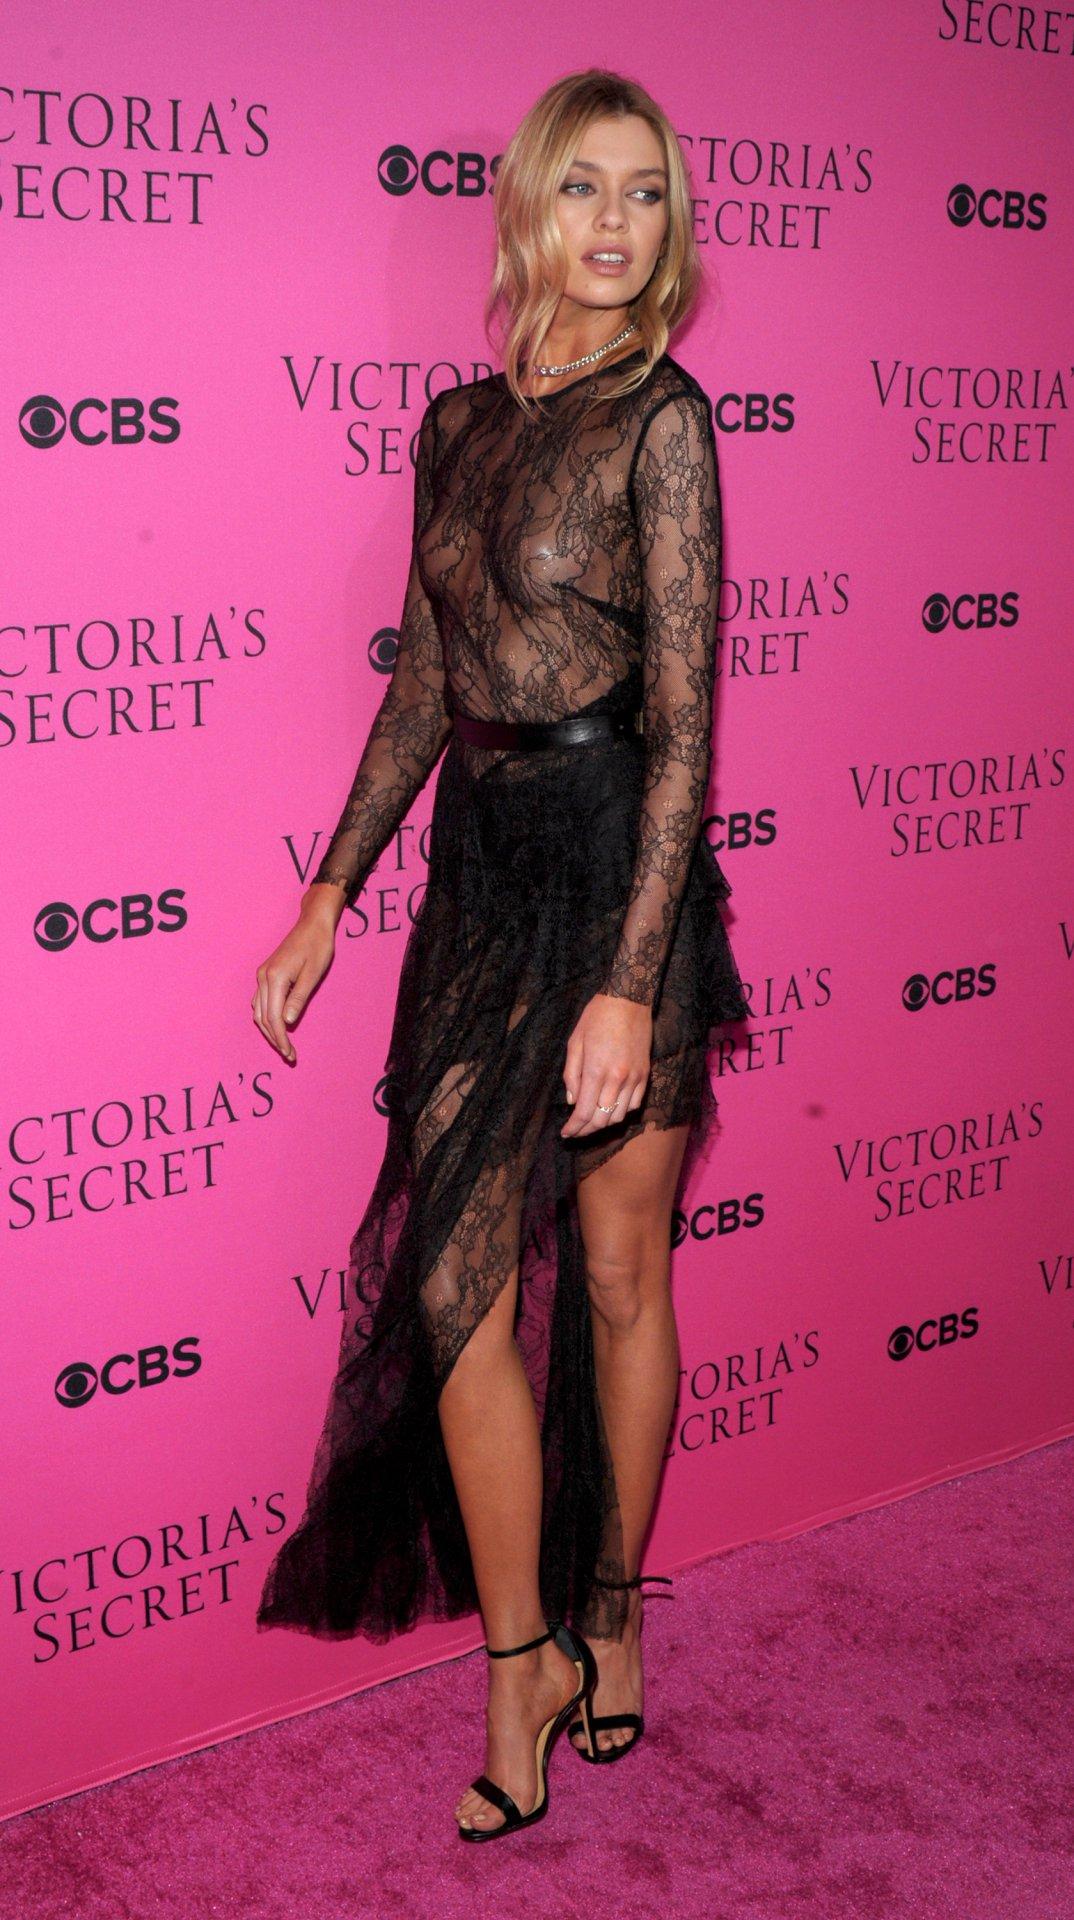 Stacey solomon the brit awards at o2 arena in london,Dakota johnson green carpet fashion awards 2019 in milan Erotic photos Chae Min Seo, etcYoung Mother,Chyna ellis bikini